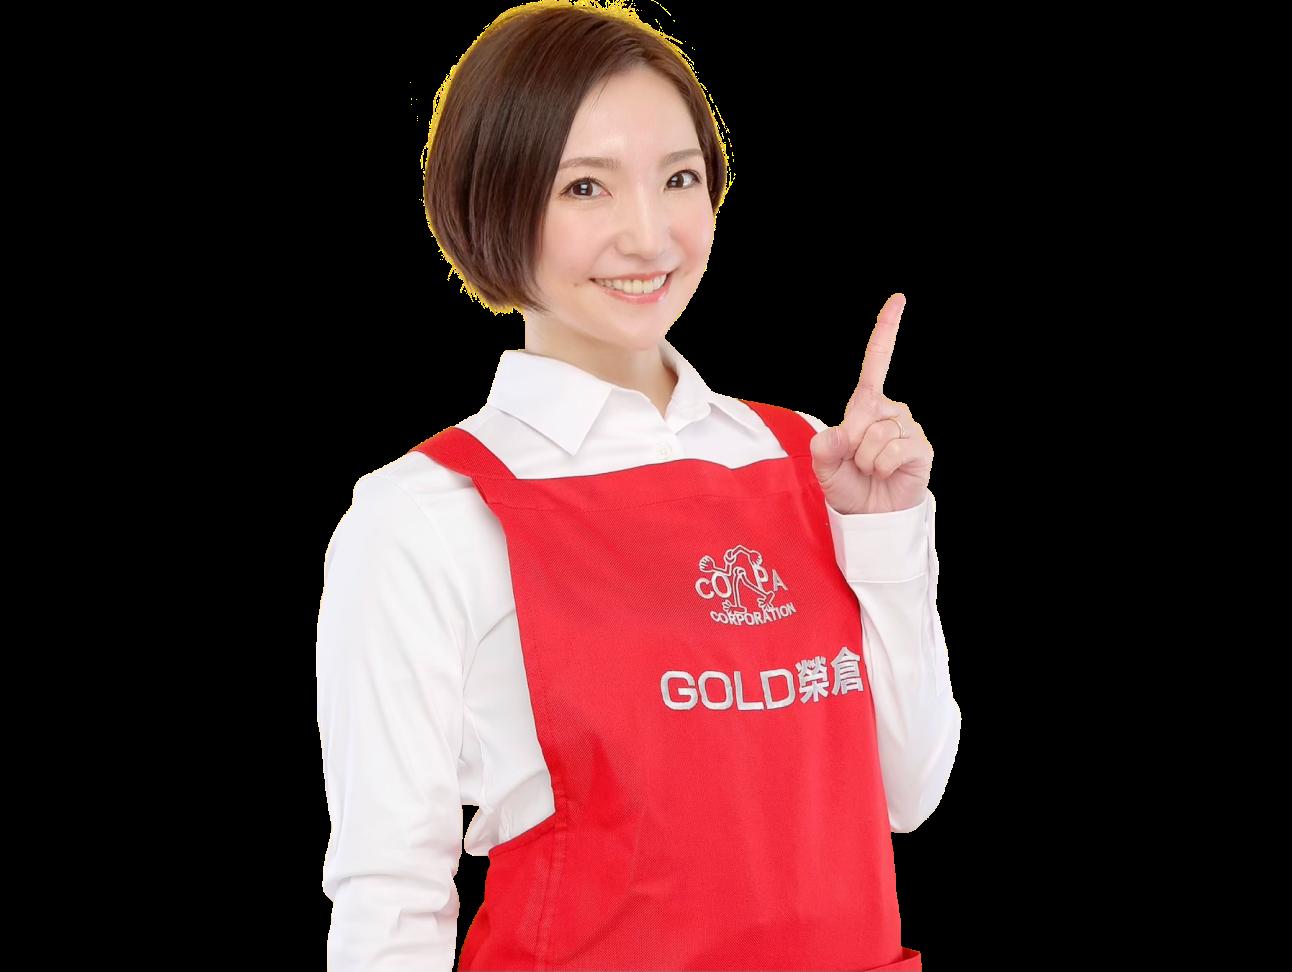 GOLD榮倉